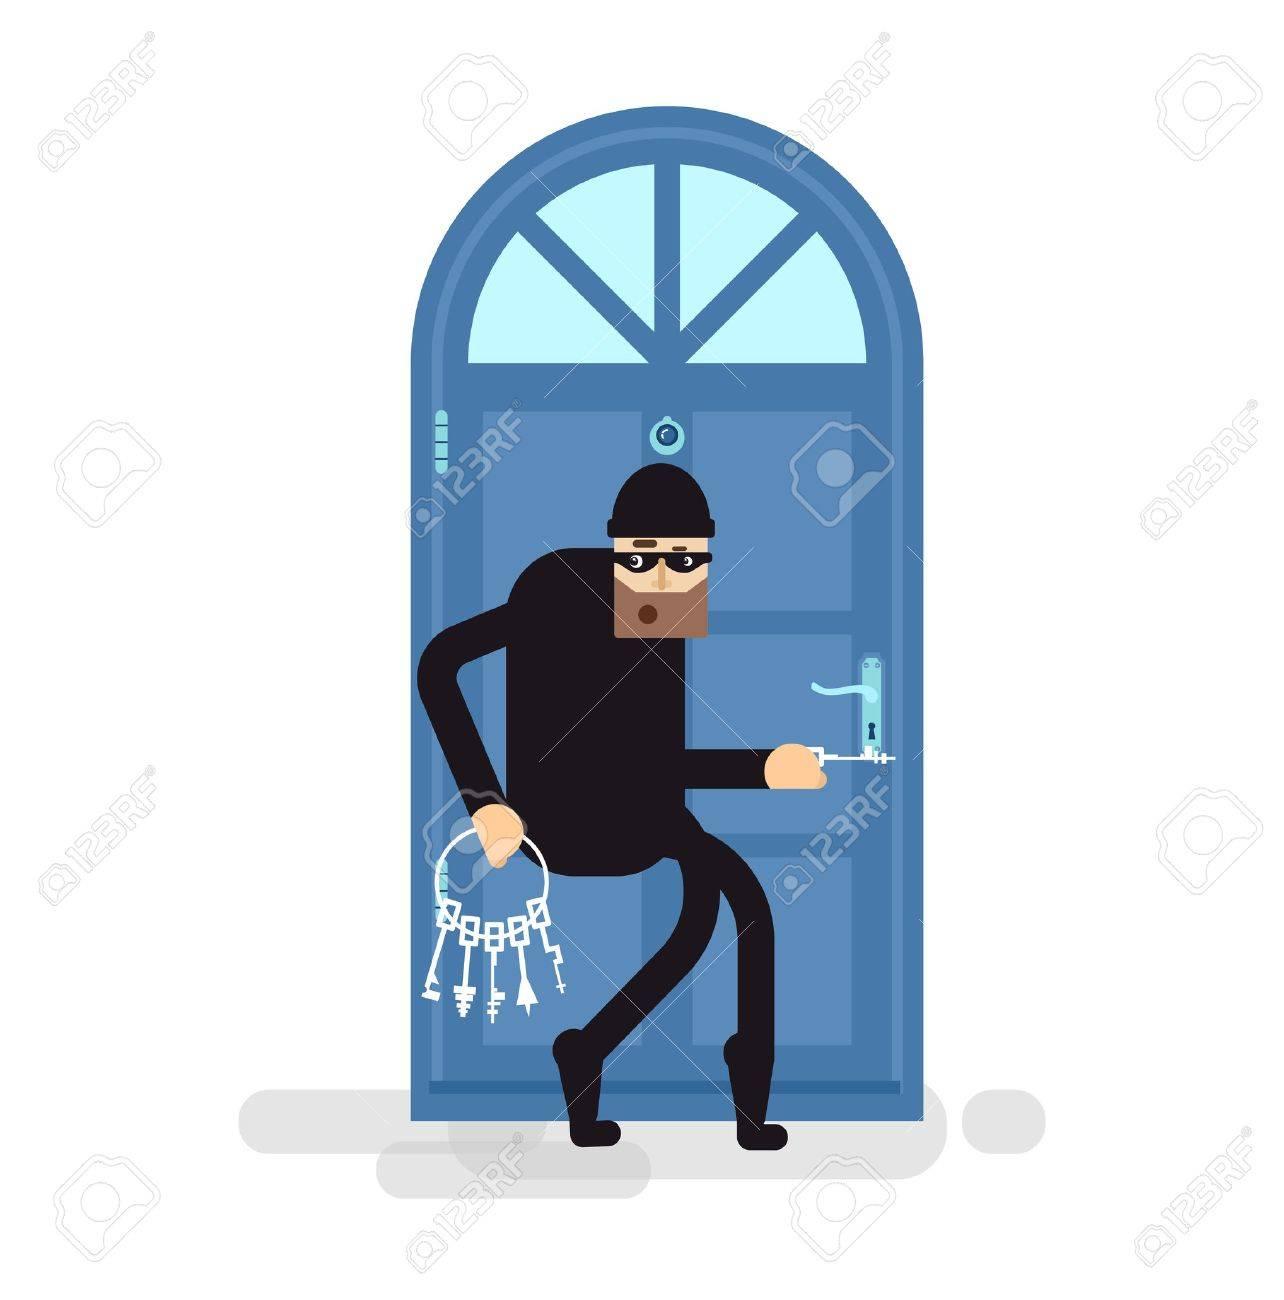 Stock Vector isolated illustration thief burglar sneaks to door attacker holding bunch of skeleton  sc 1 st  123RF.com & Stock Vector Isolated Illustration Thief Burglar Sneaks To Door ...